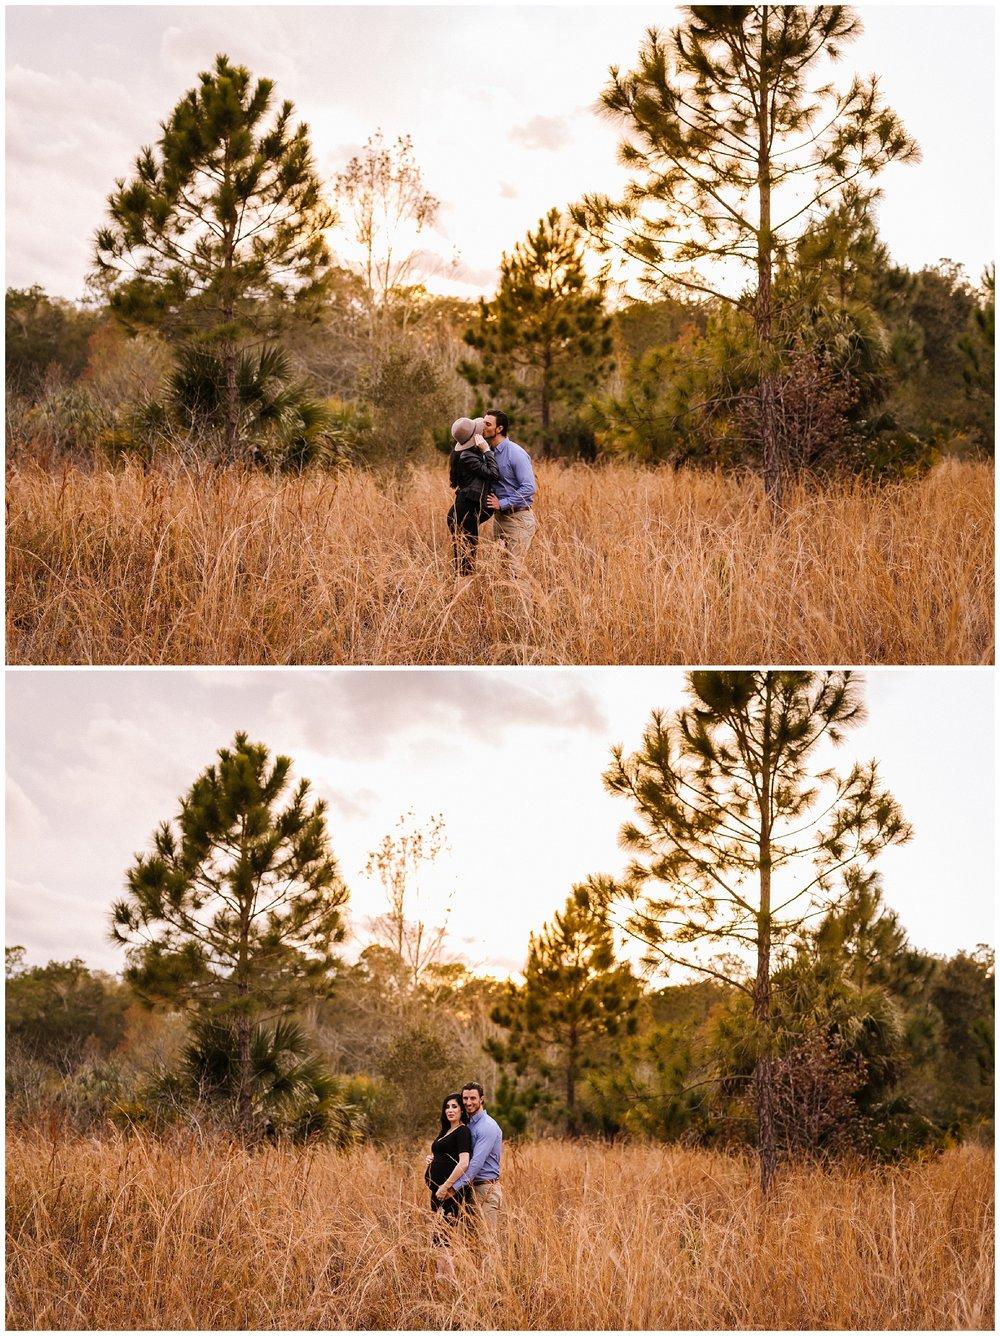 Tampa-maternity-photographer-morris-bridge-park-hip-tight-black-dress-woods_0017.jpg